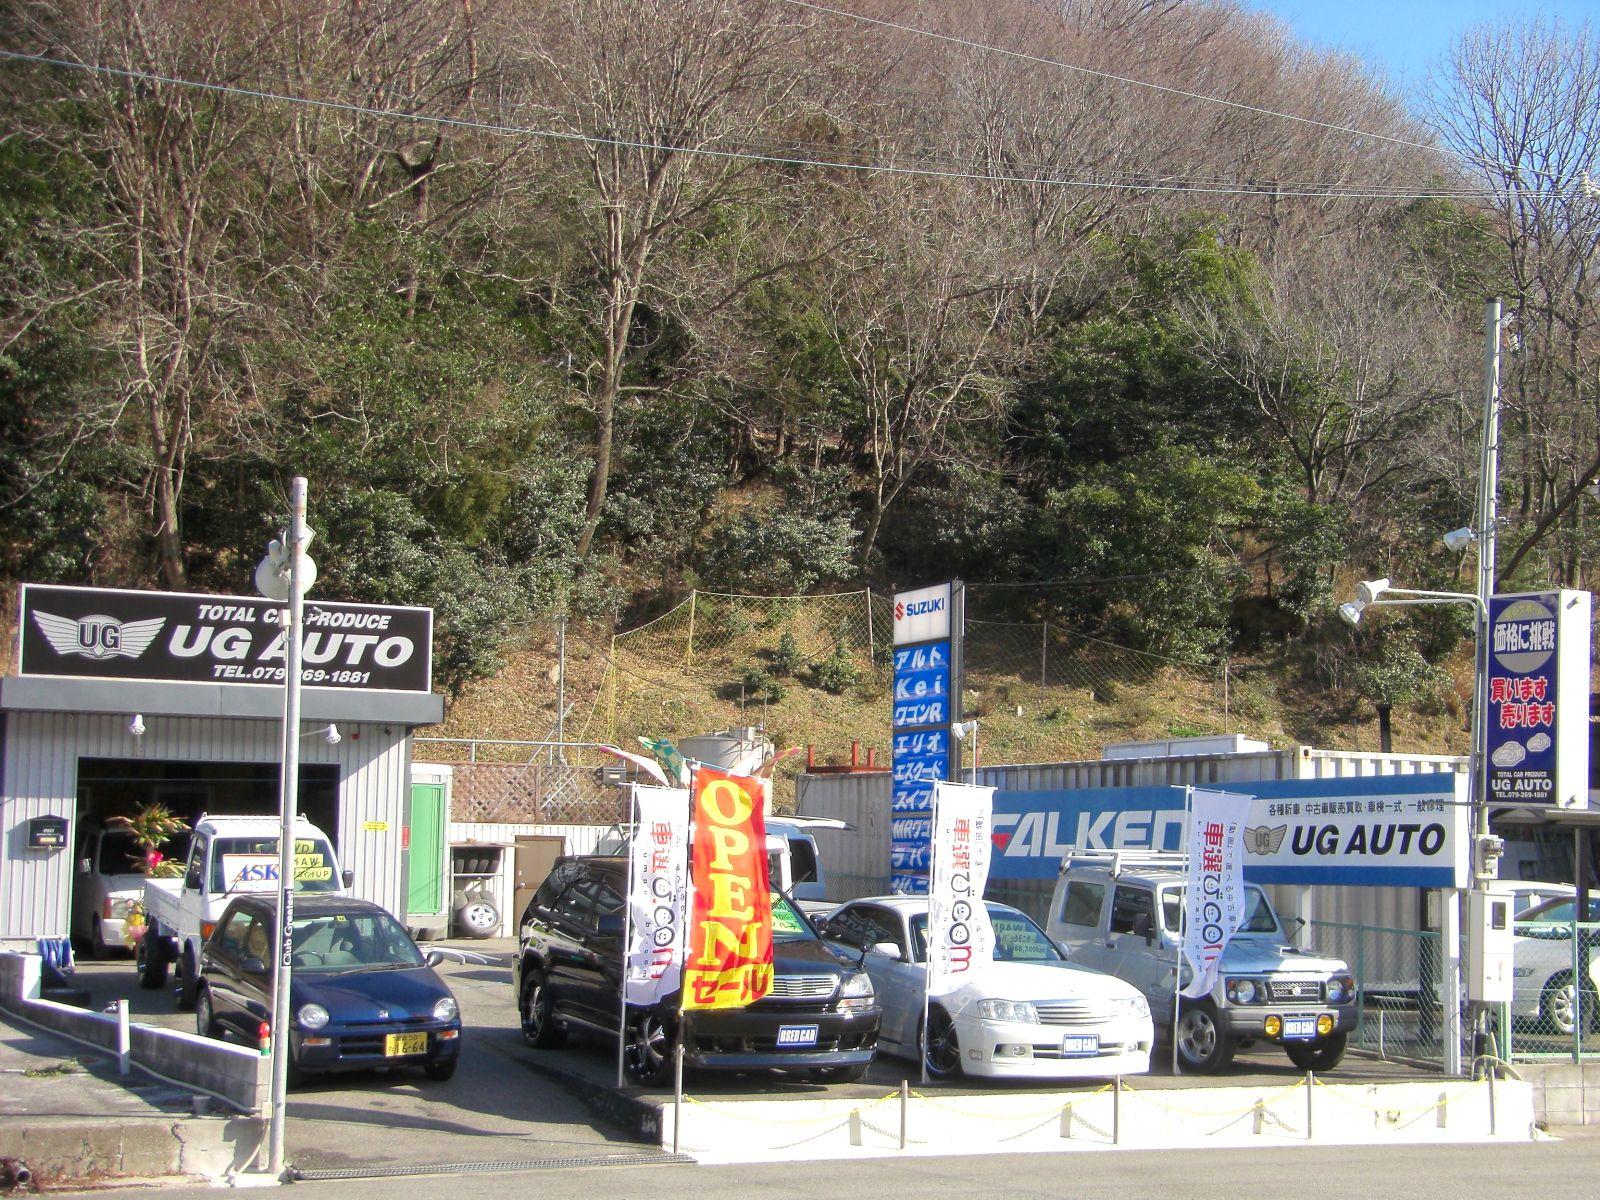 UG AUTO 【ユージーオート】